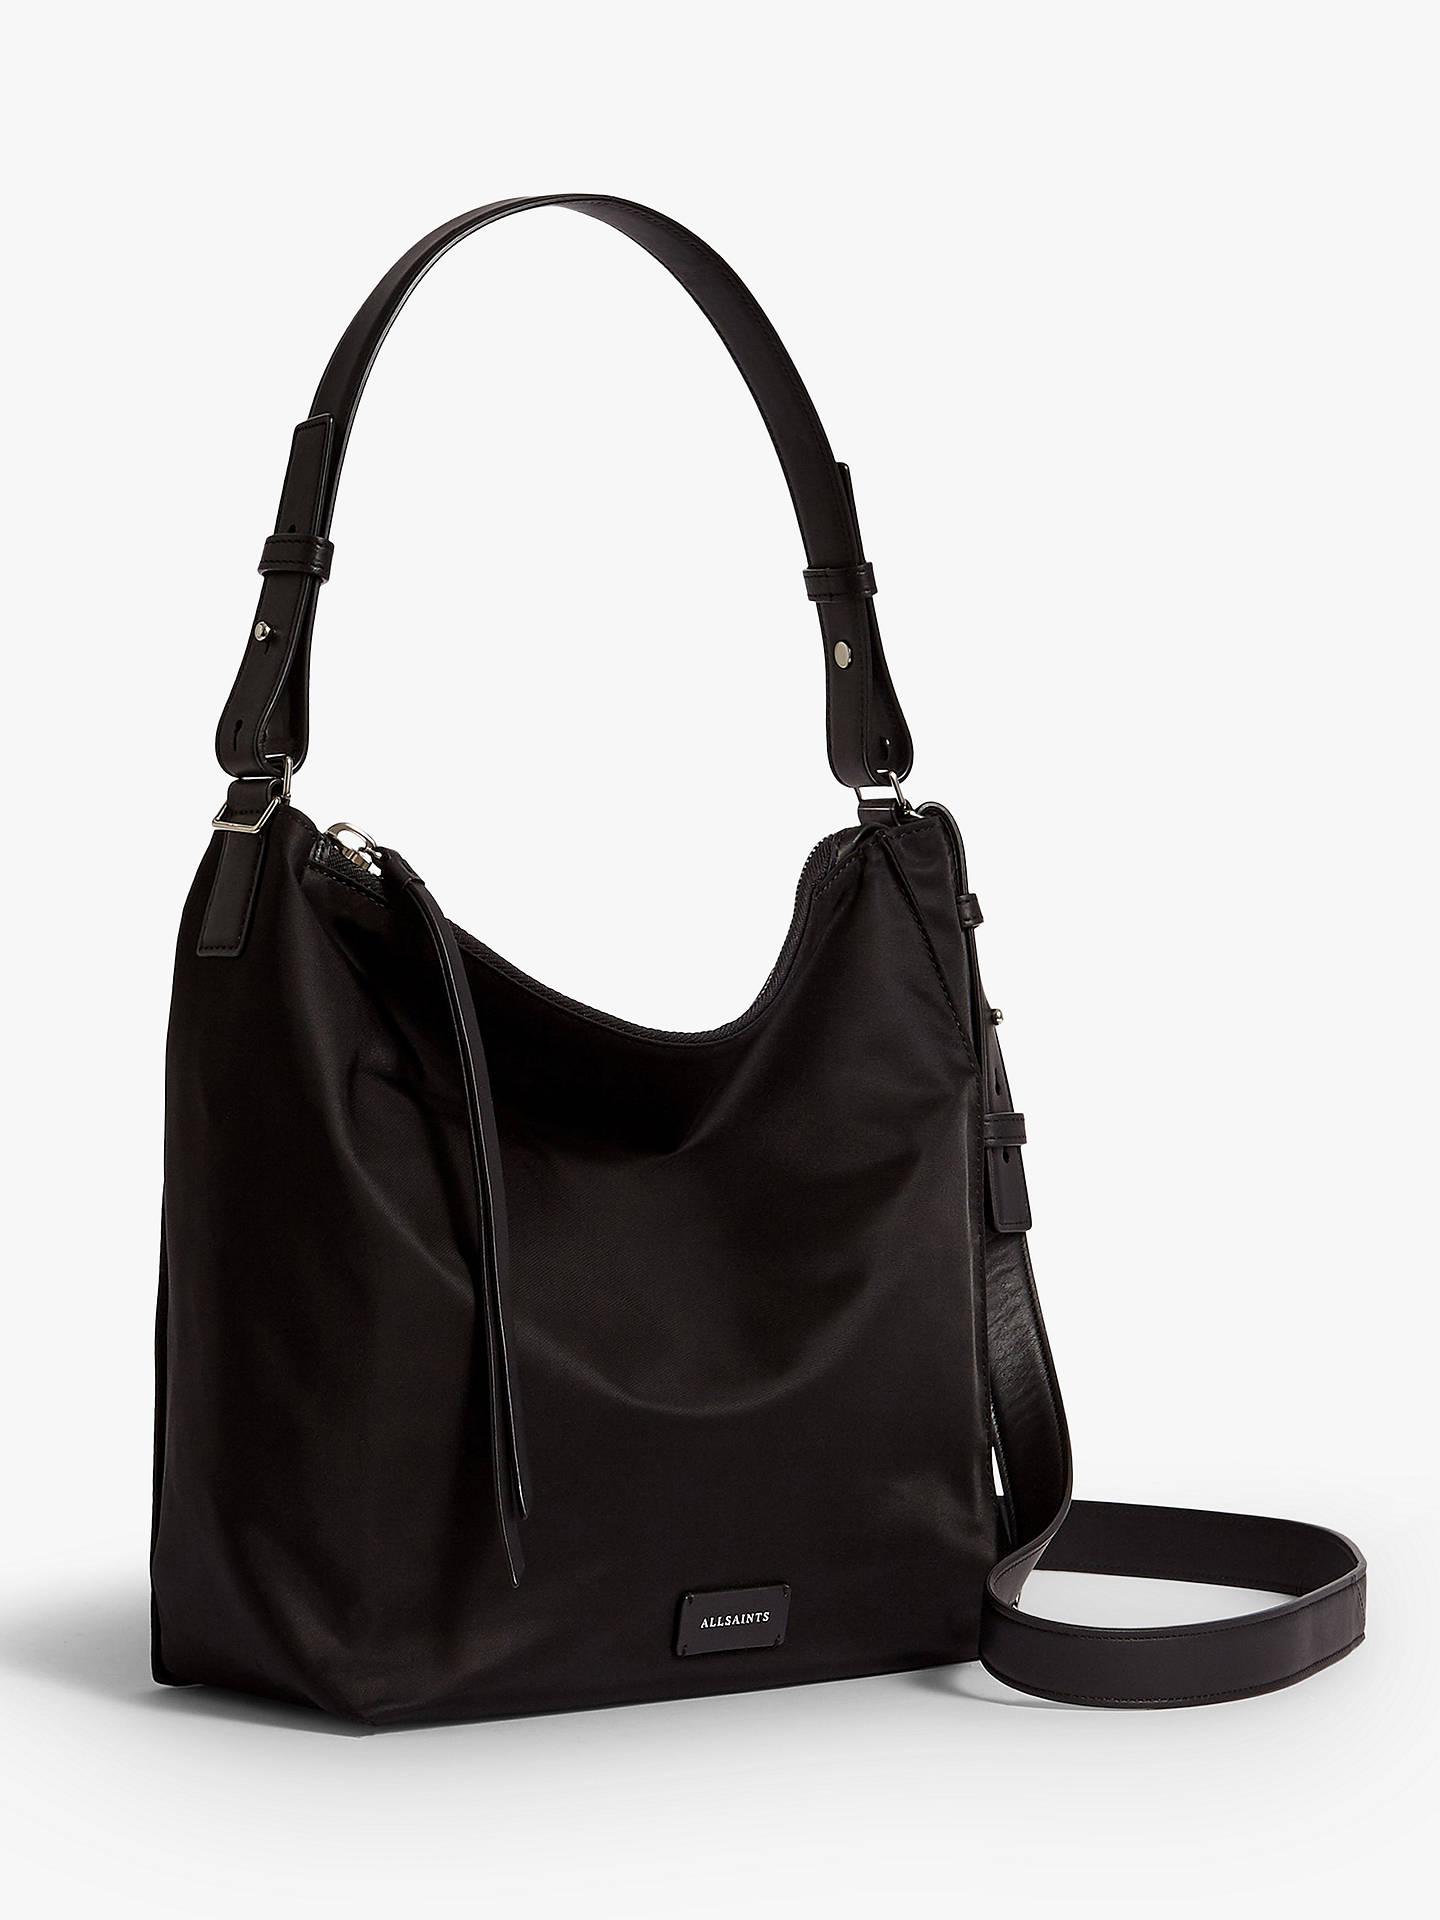 c039ea6a73 ... Buy AllSaints Nilo Kita Crossbody Bag, Black Online at johnlewis.com ...